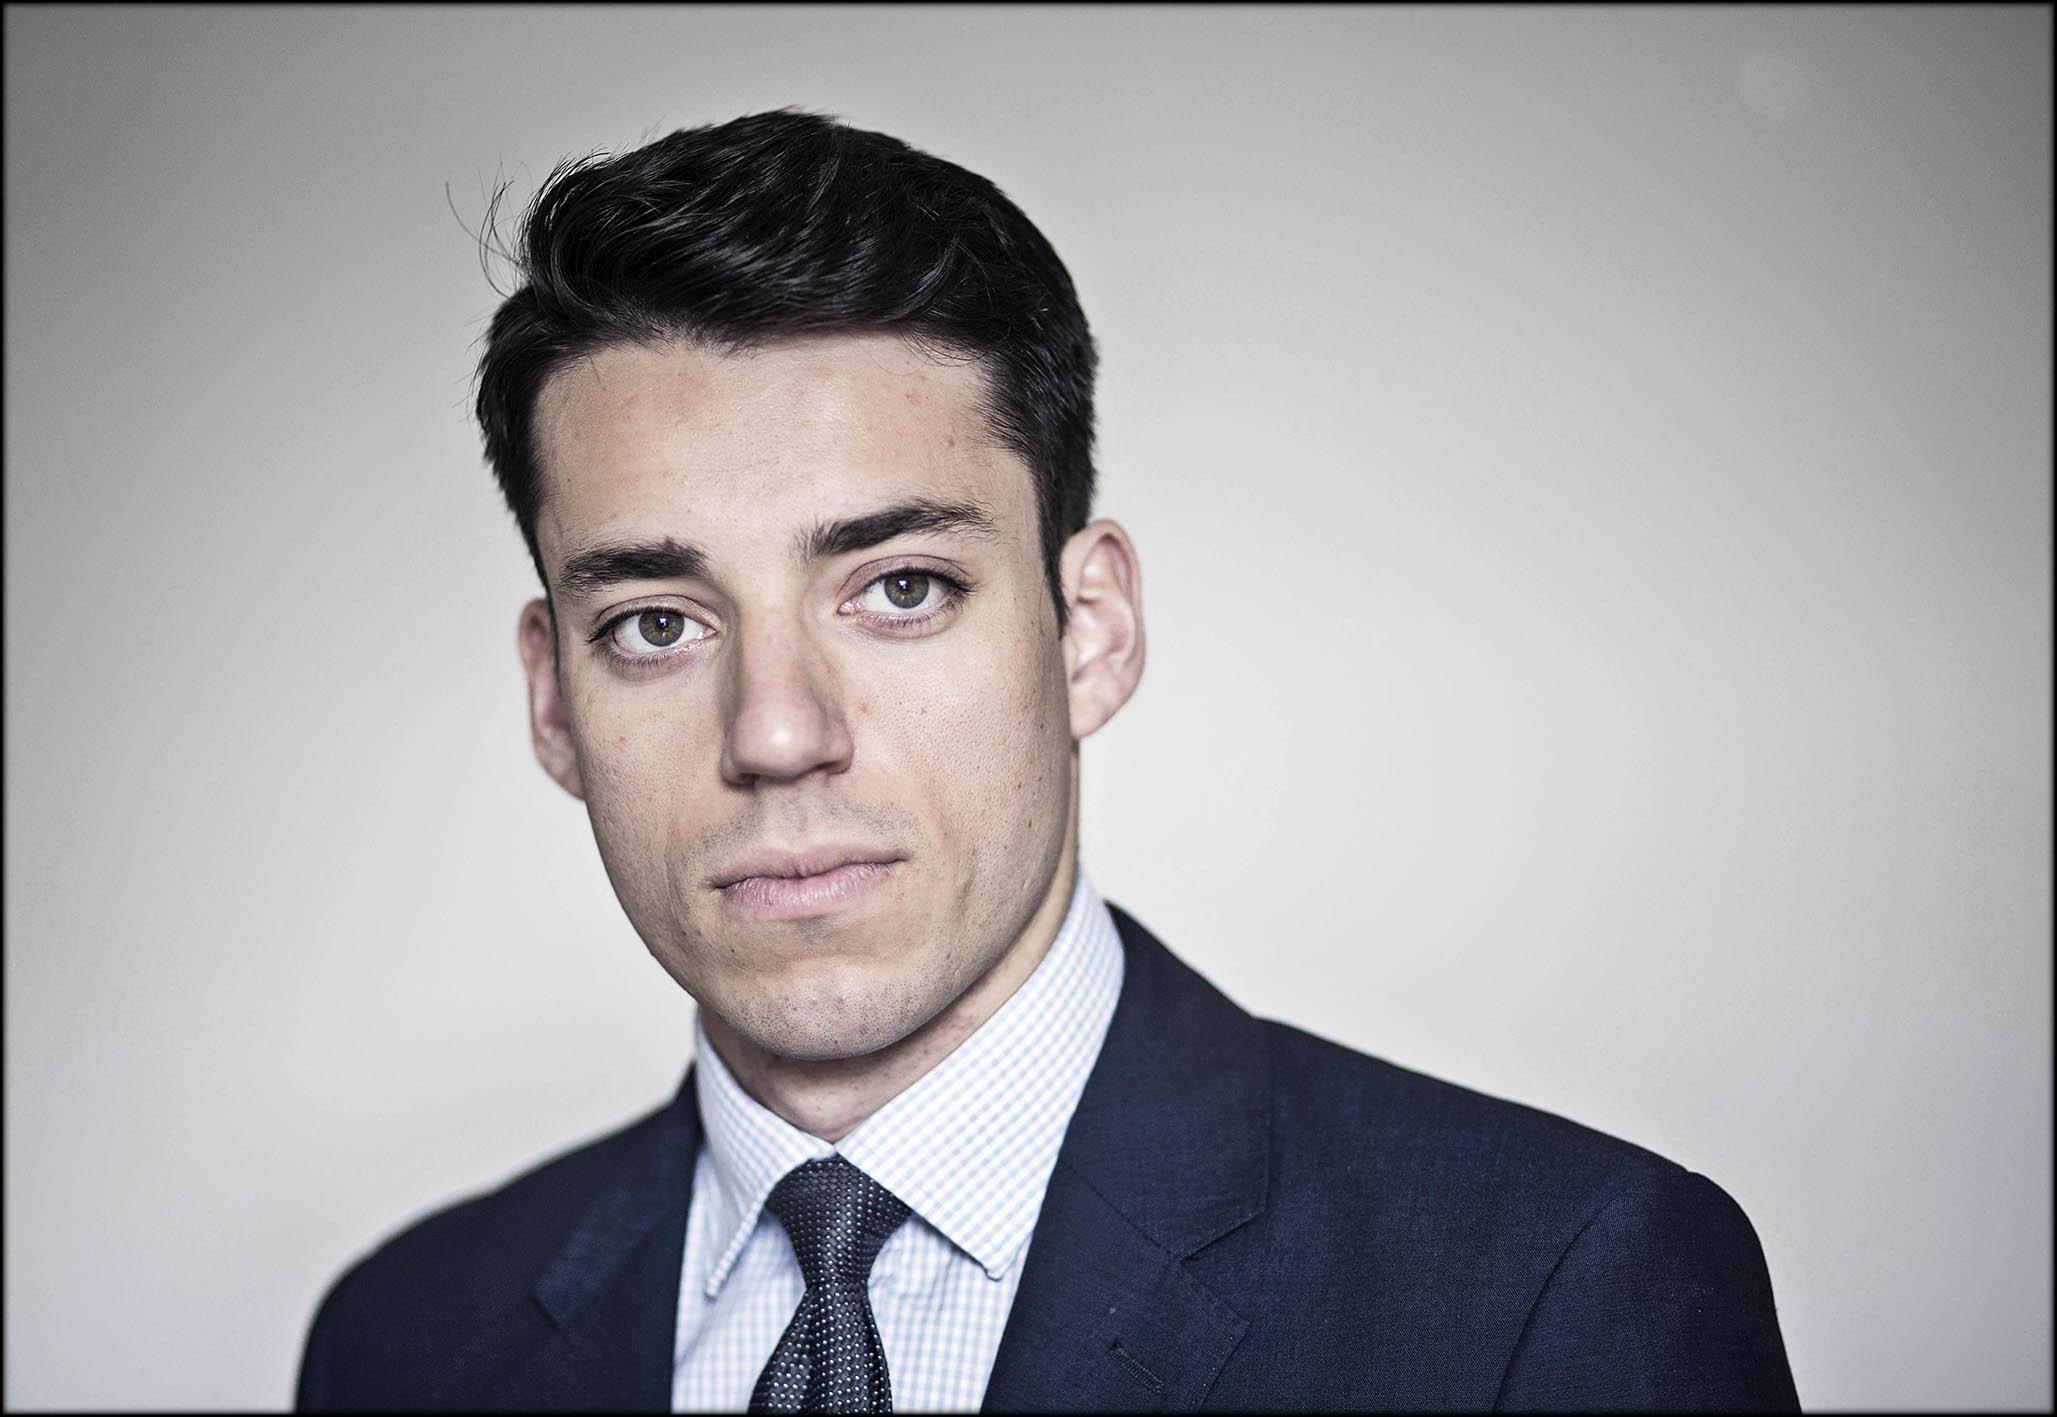 rupert-hartley-corporate-portrait.JPG